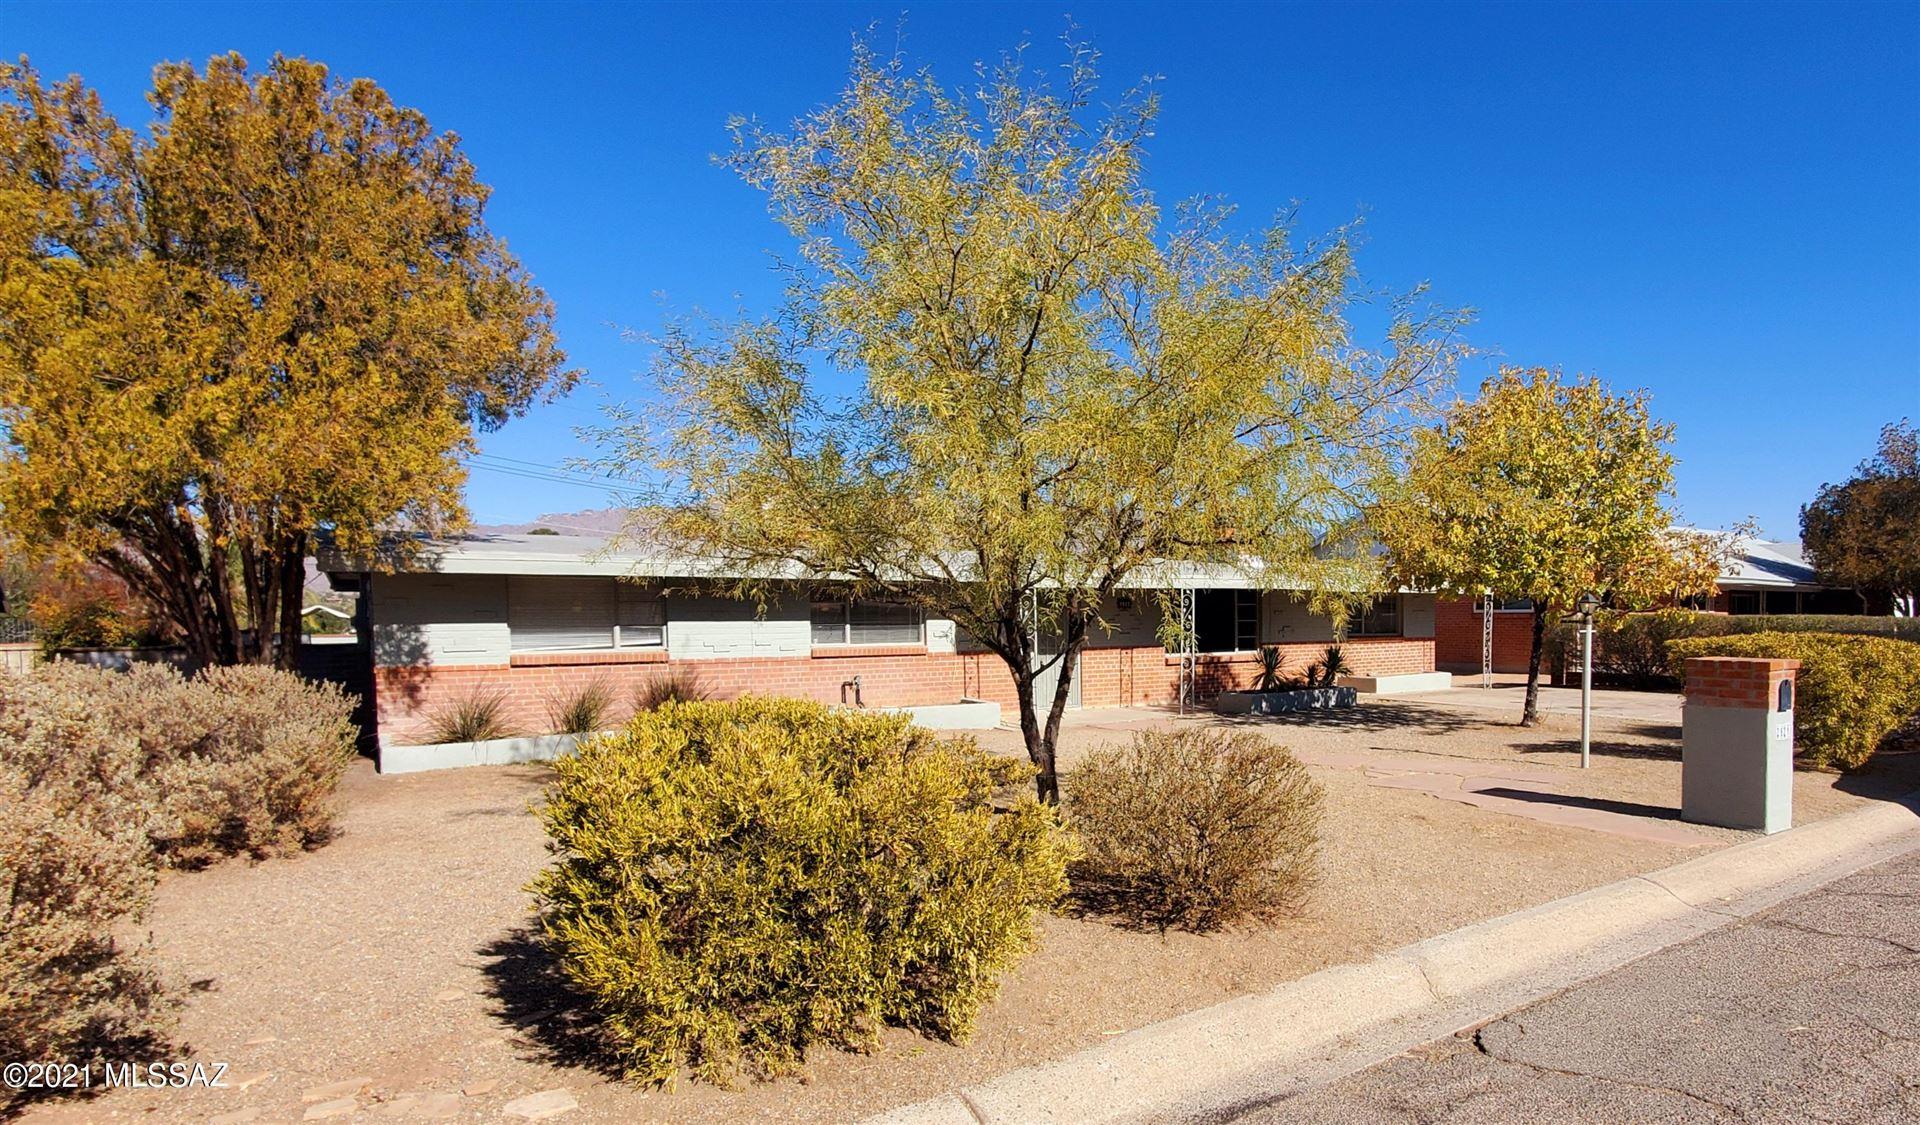 2821 E Greenlee Street, Tucson, AZ 85716 - MLS#: 22100664